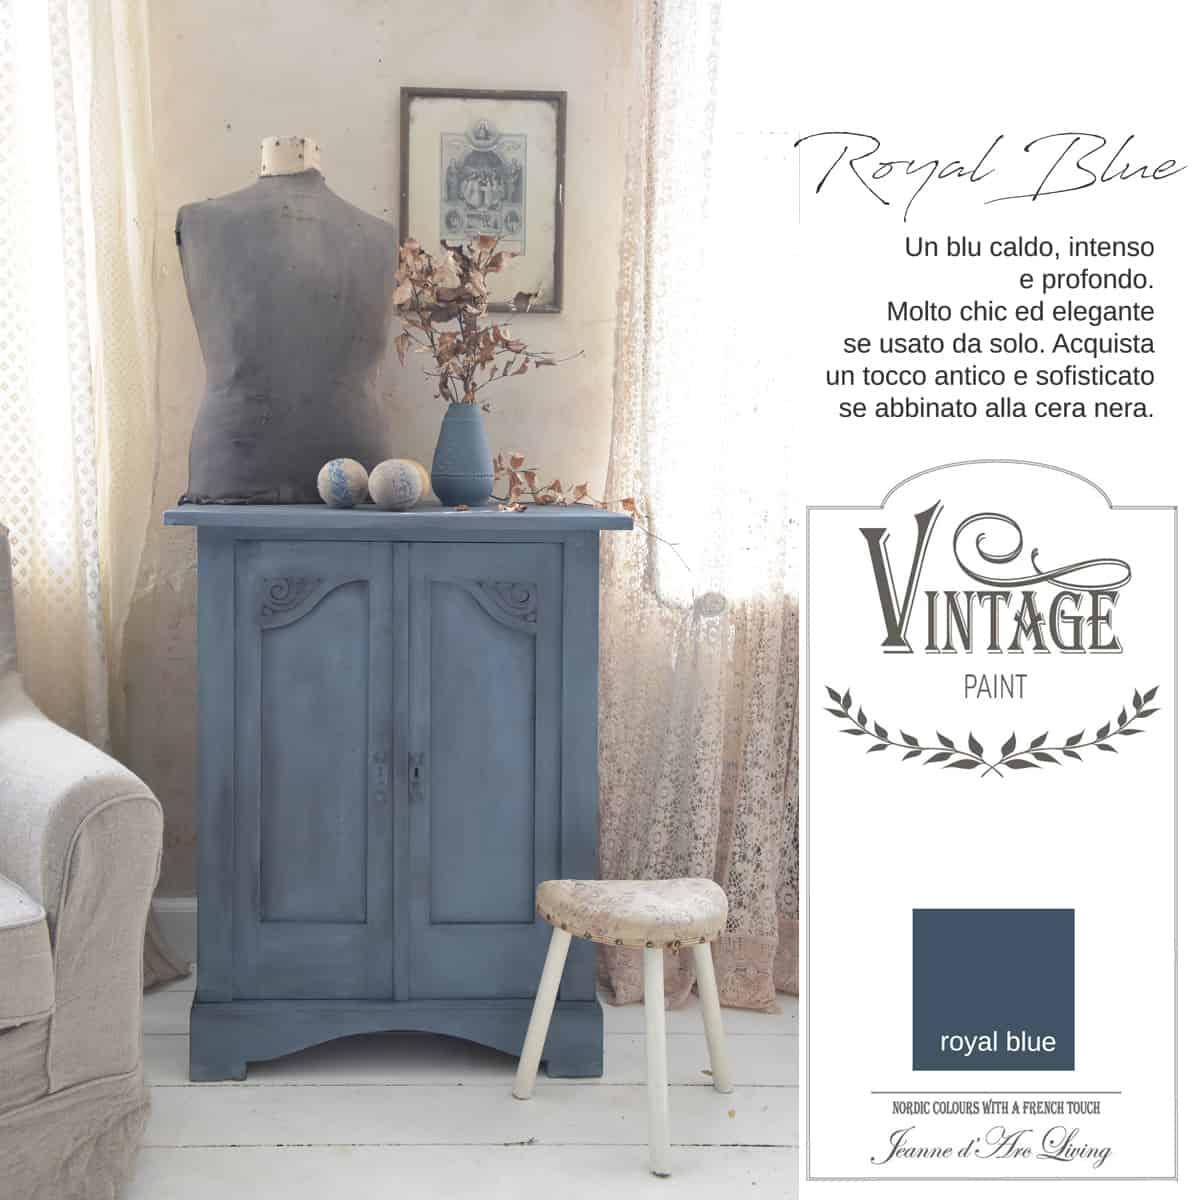 royal blue blu azzurro vintage chalk paint vernici shabby chic autentico look gesso